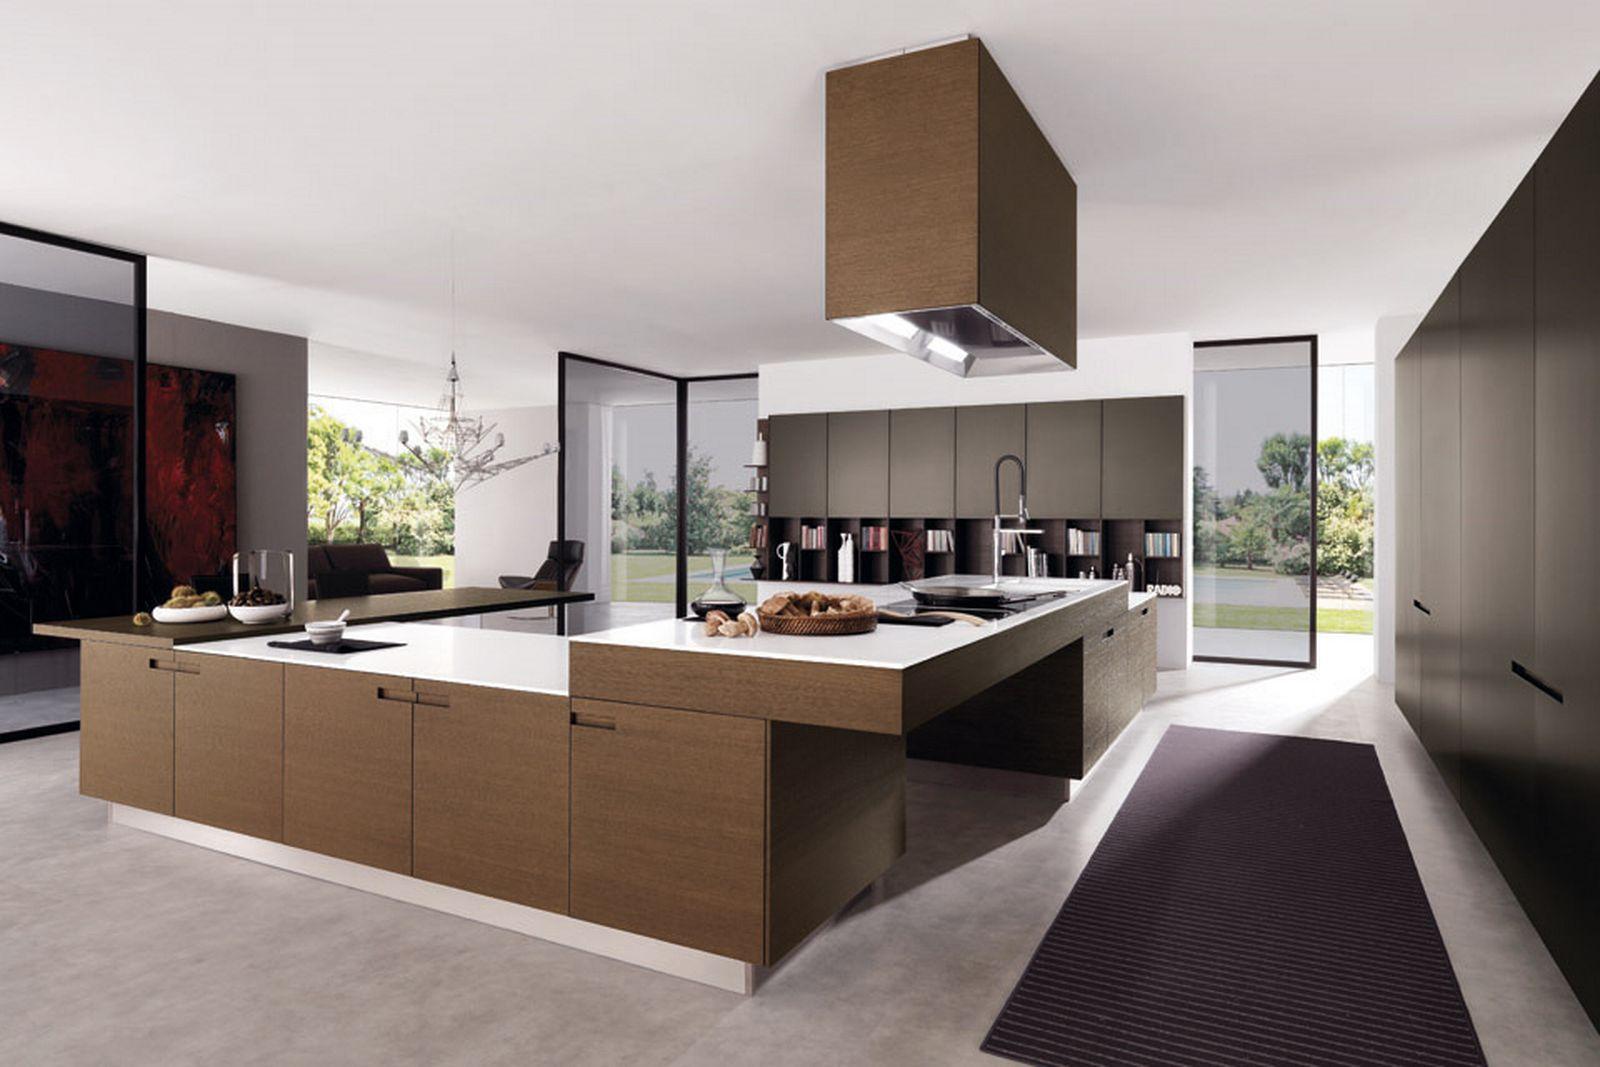 Modern Kitchen Design (Image 8 of 10)